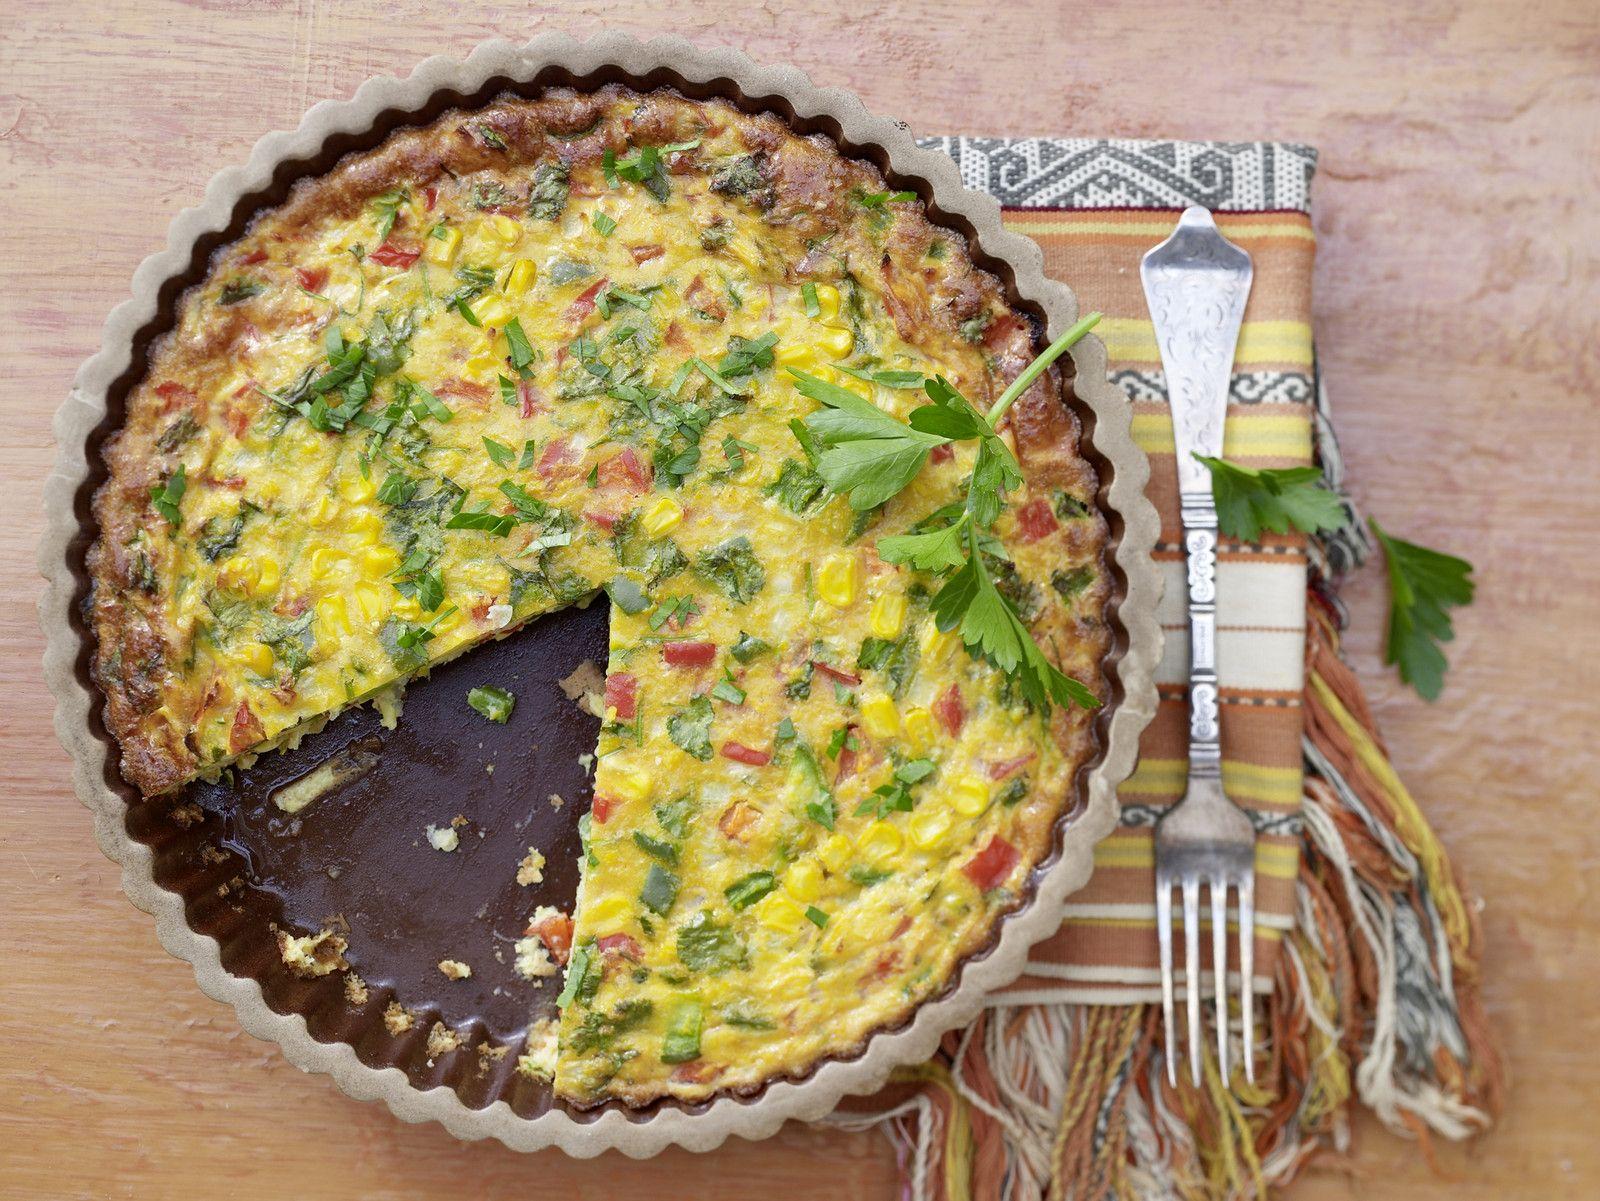 Vegetarische Sommerküche Rezepte : Kochbuch vegetarische sommergerichte eat smarter